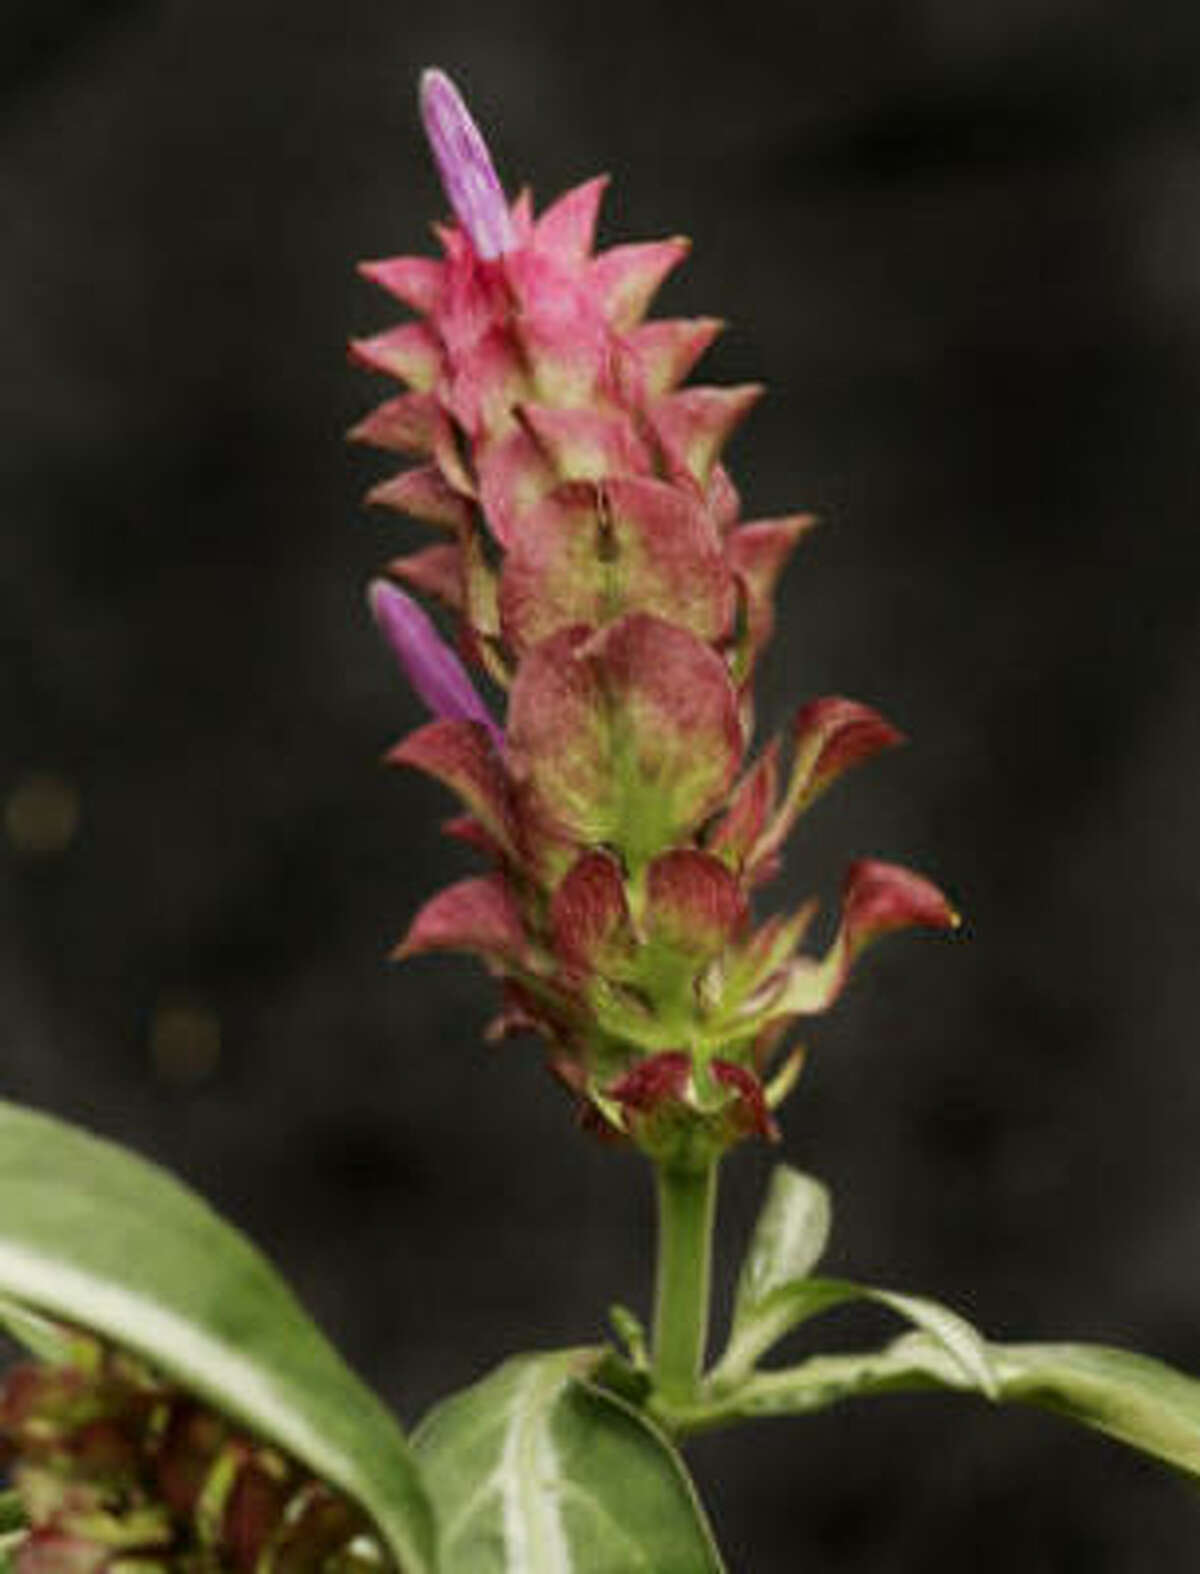 Rose pinecone plant.